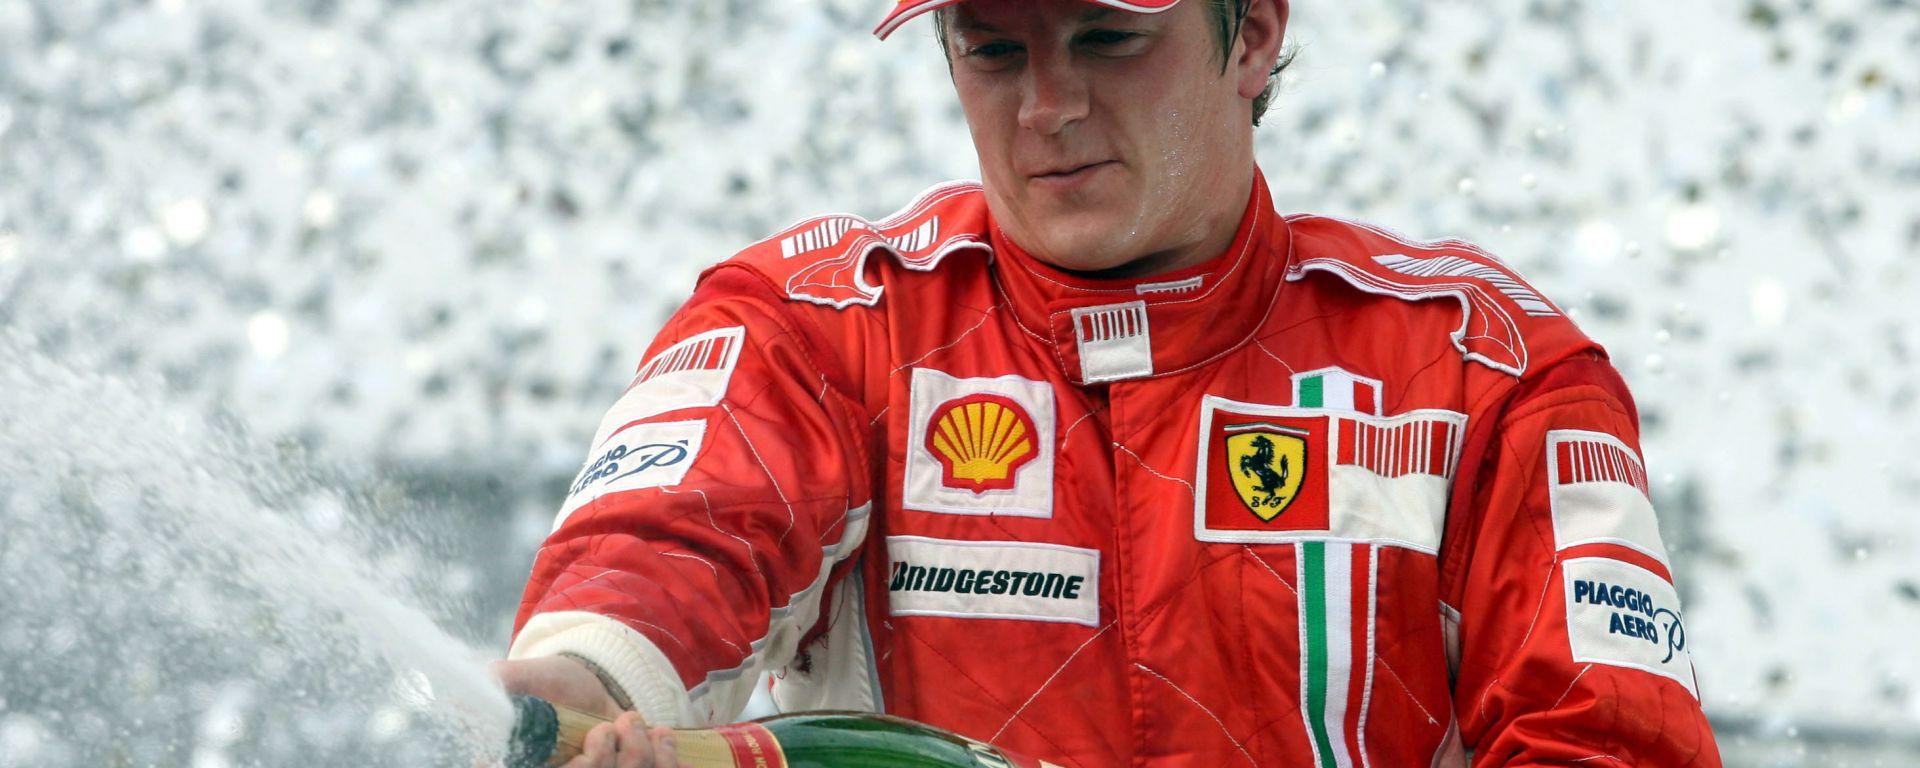 F1, GP Brasile 2007: Kimi Raikkonen (Ferrari)